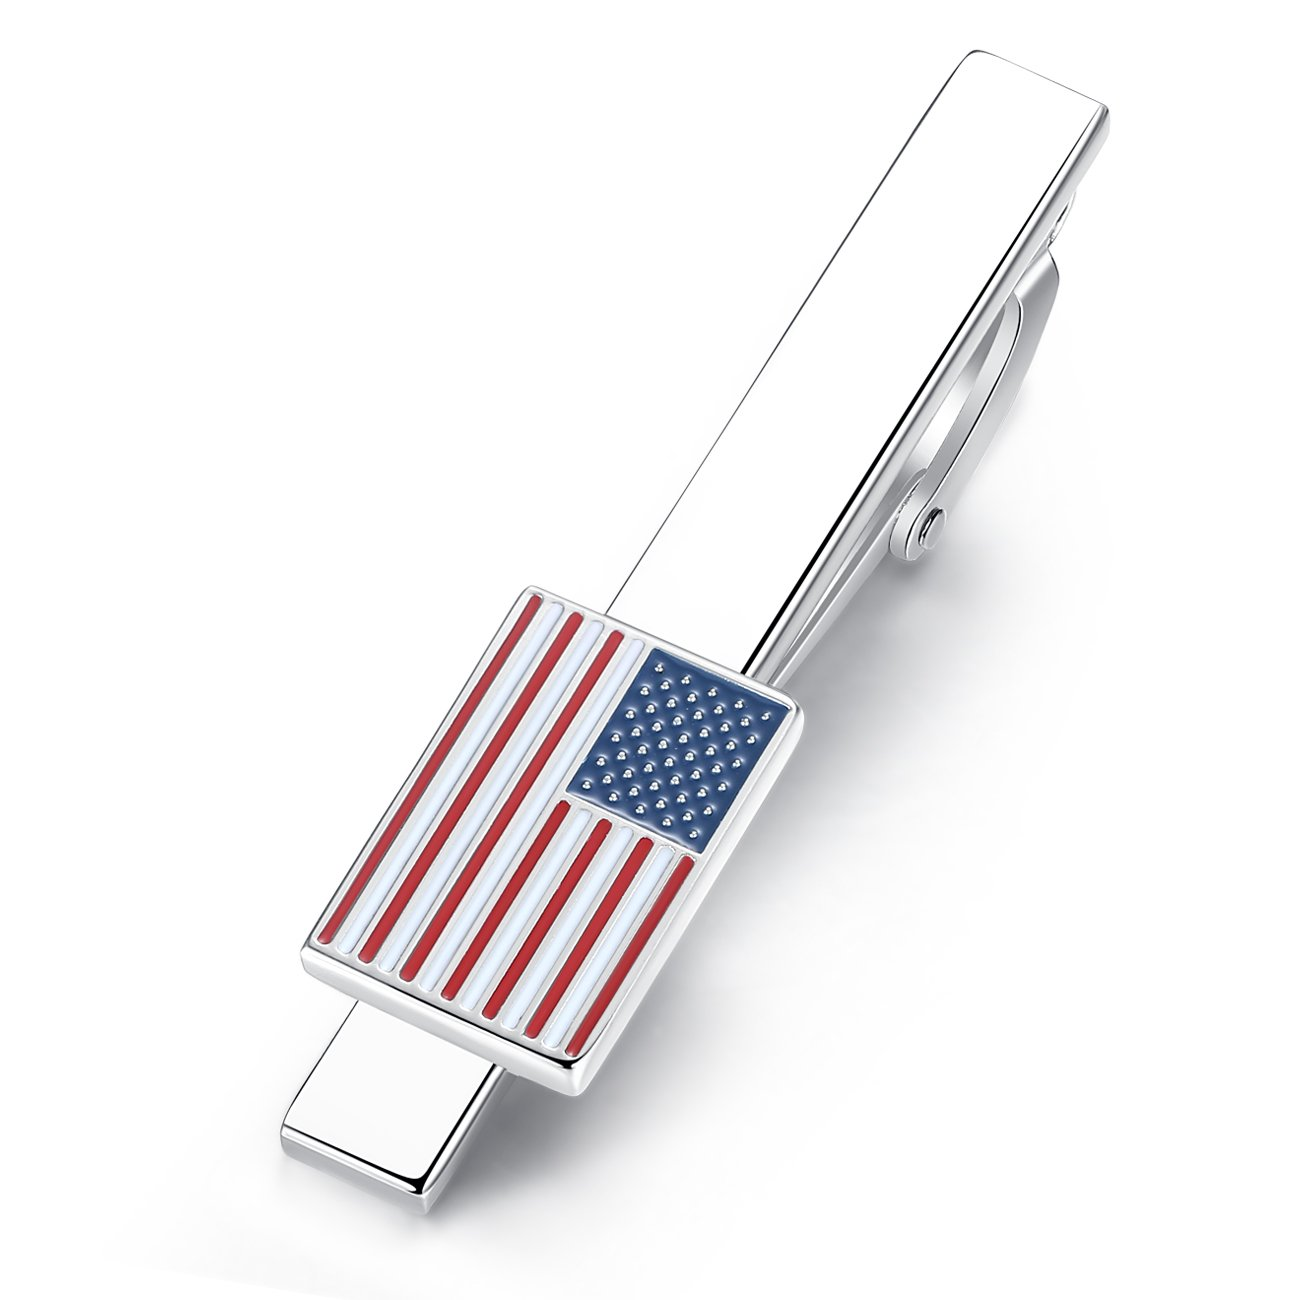 Honey Bear Mens US Flag Tie Clip Bar - Stars and Stripes American Flag, for Business Wedding Christmas Gift 5.4cm Kardex 118-tie